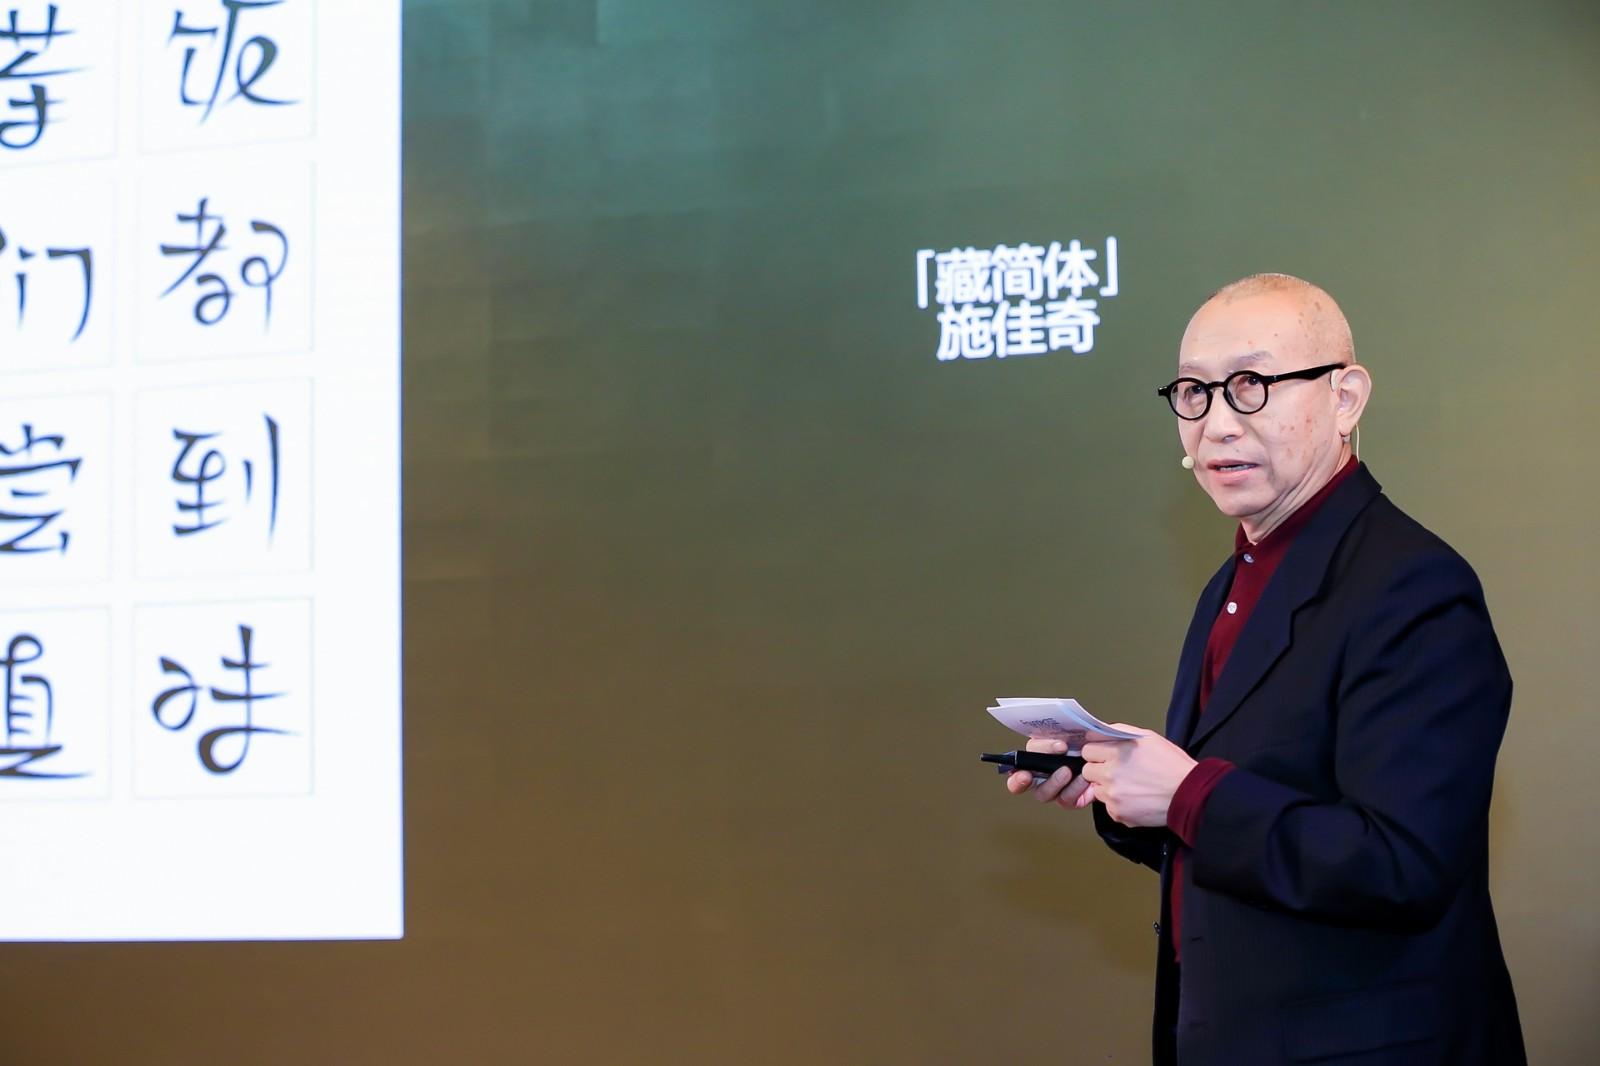 https://ft-bk1.oss-cn-zhangjiakou.aliyuncs.com/Public/Uploads/img/n_content_20201210173425_4340.jpg